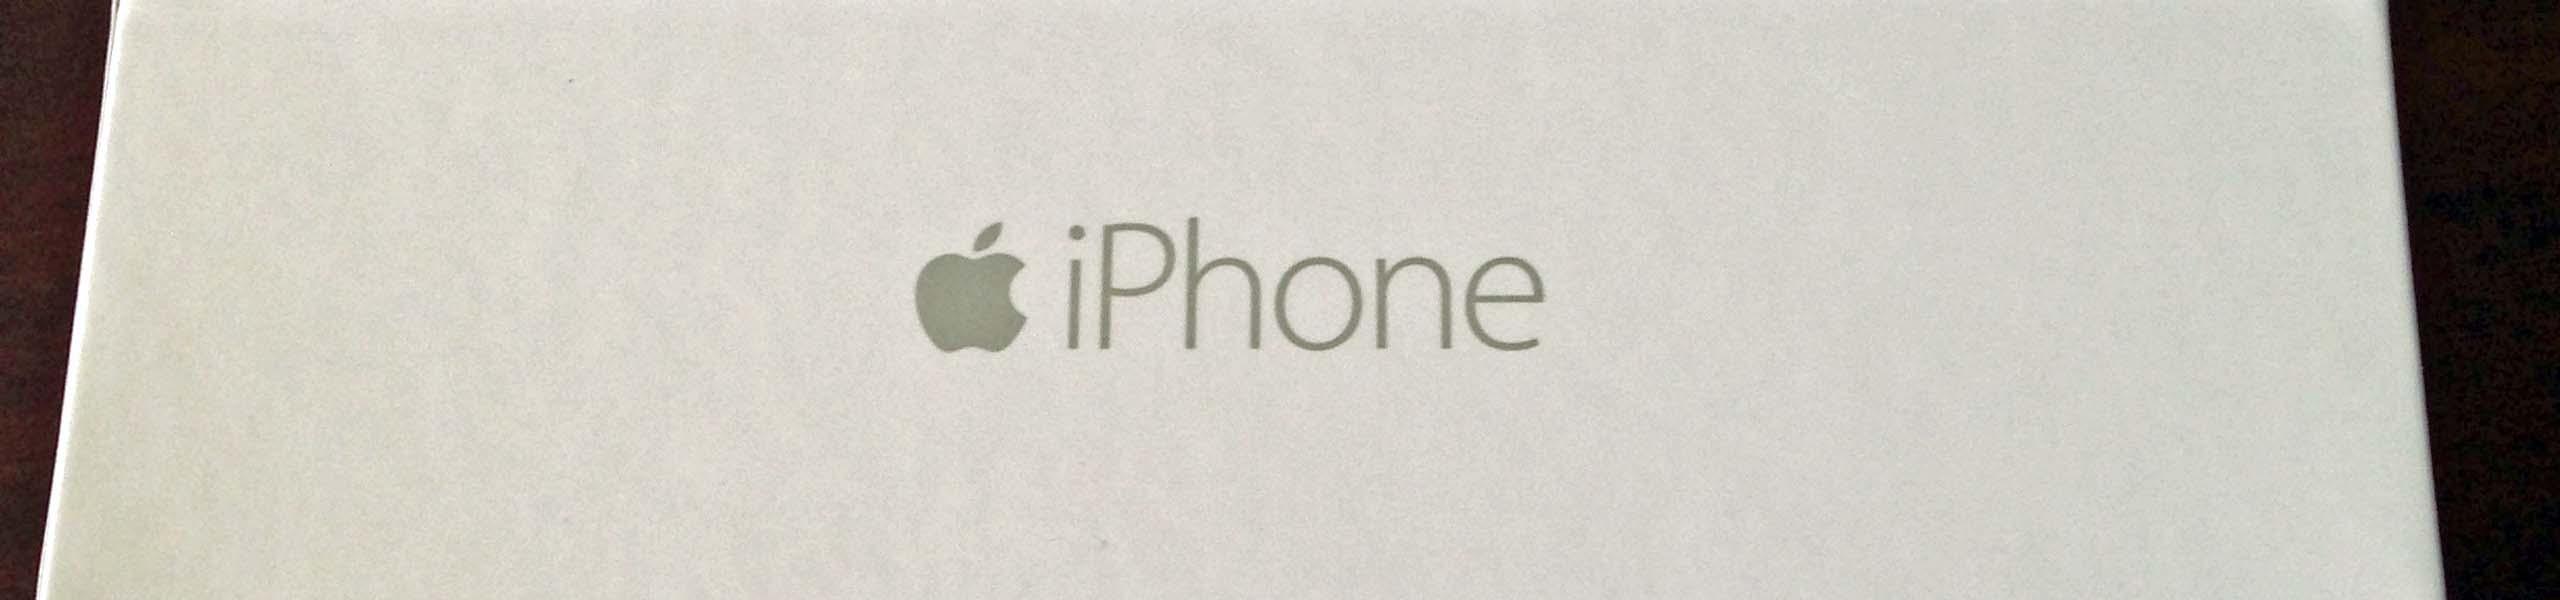 Apple's iPhone Box